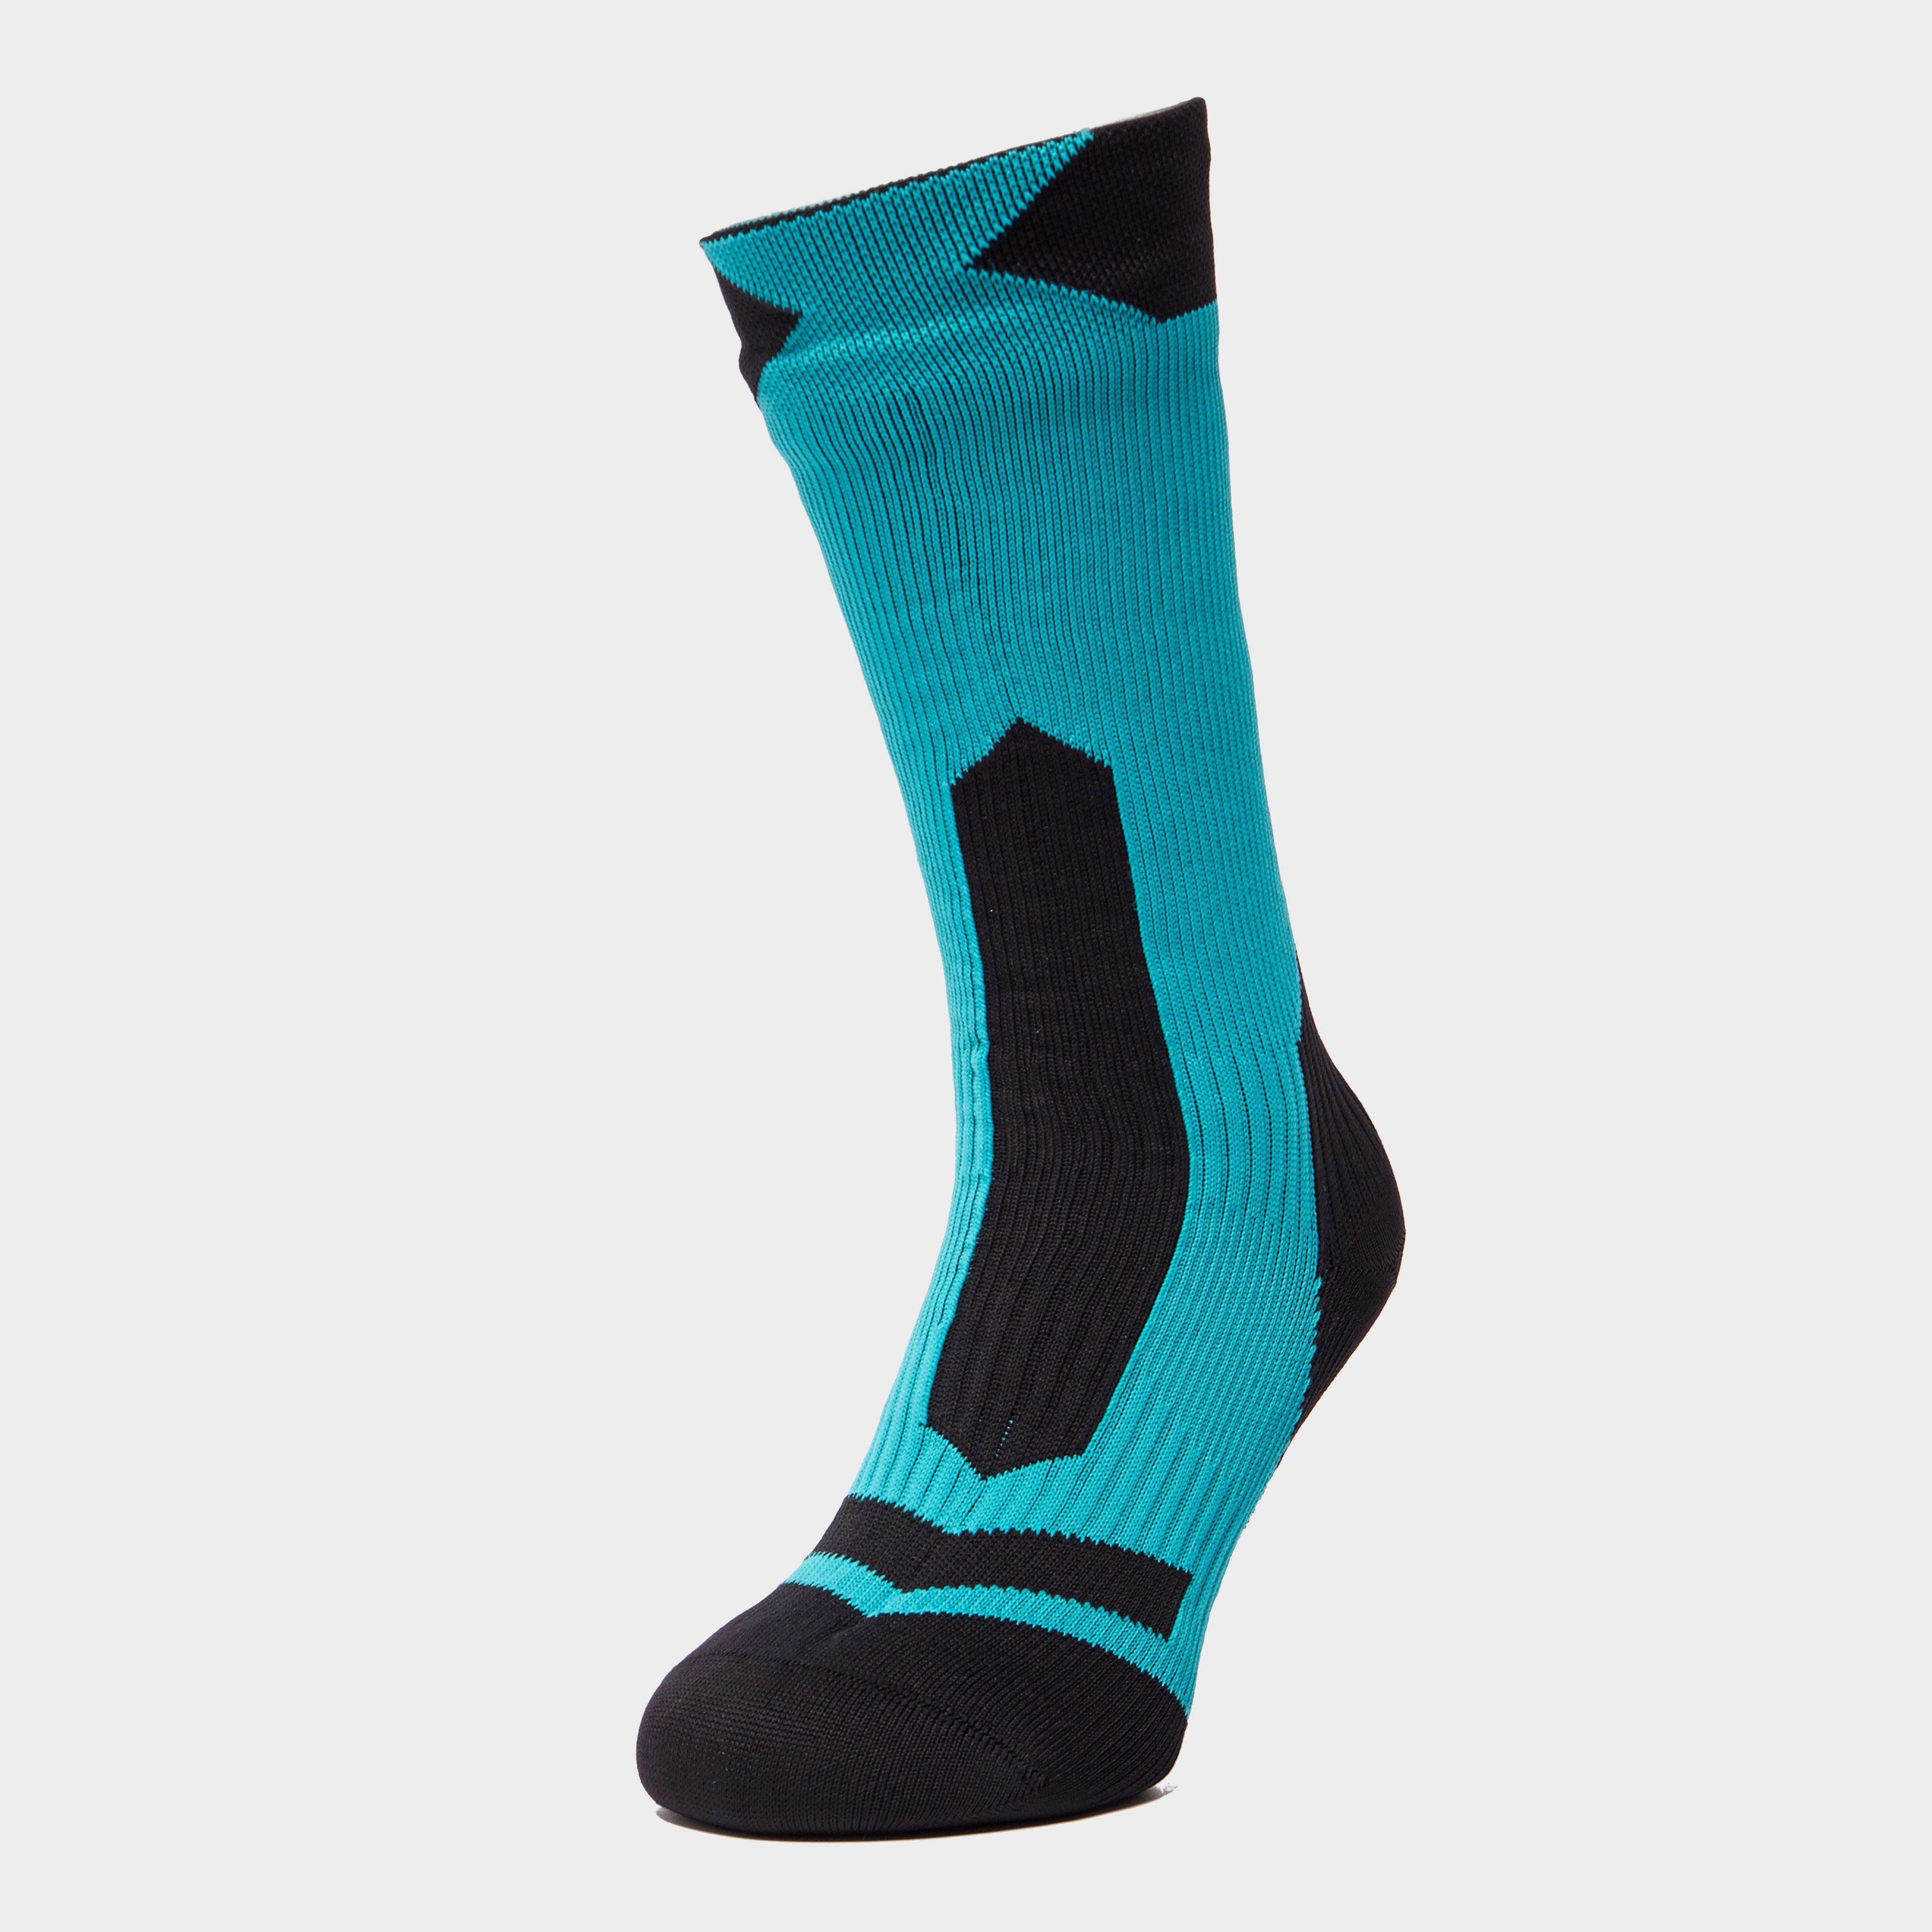 SealSkinz Sealskinz Mens Trek Mid Length Socks - Green, Green